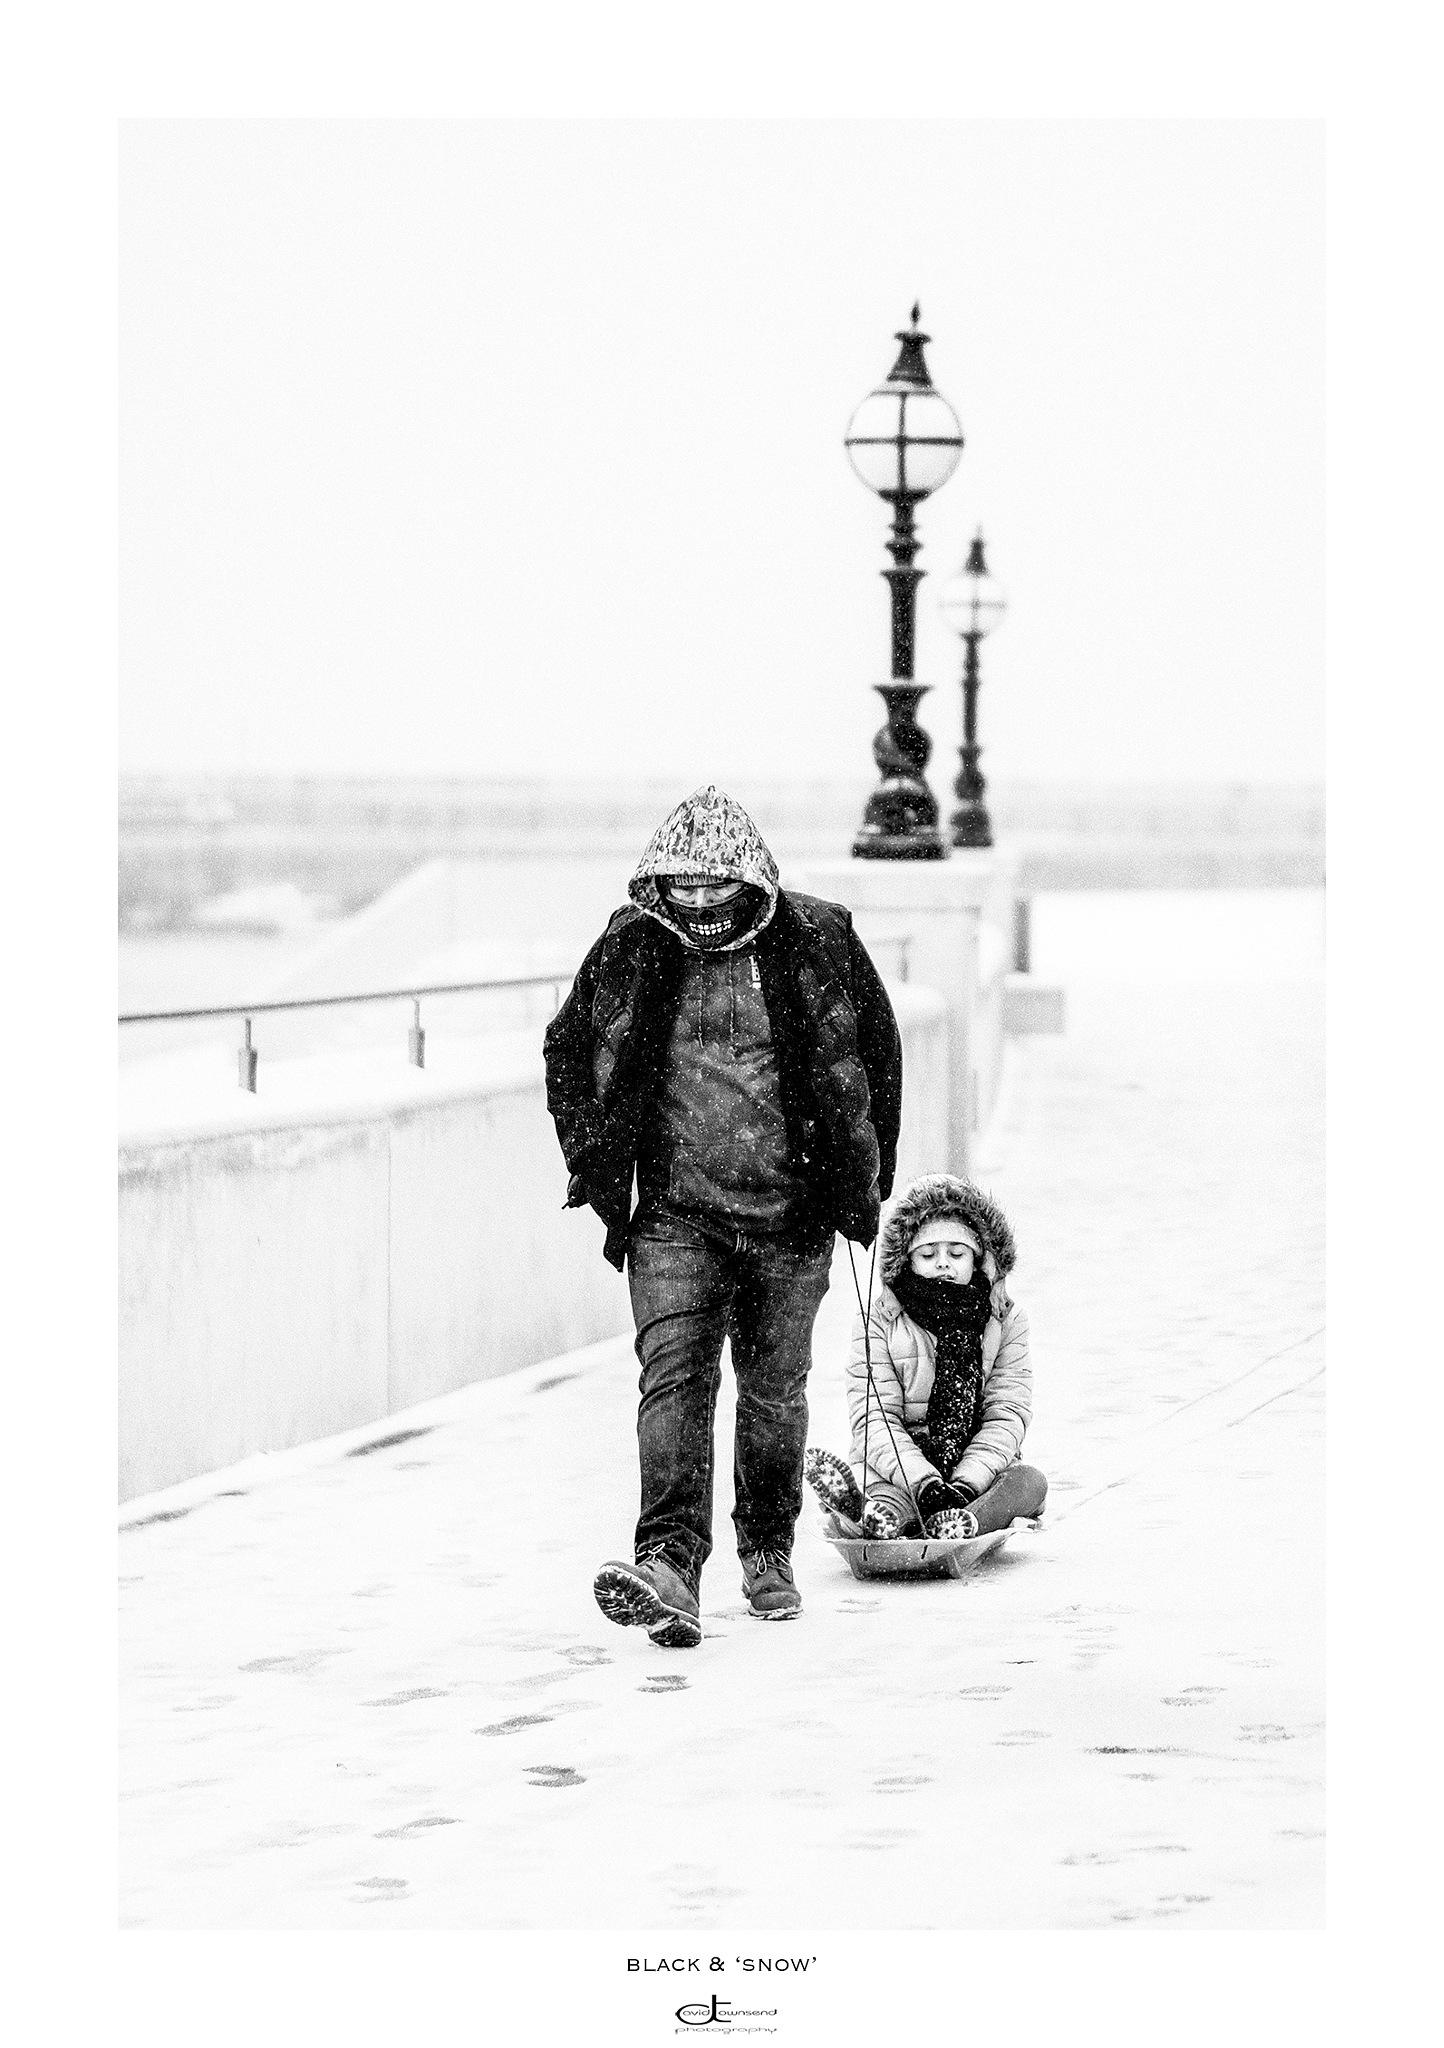 Black & 'Snow' by David Townsend